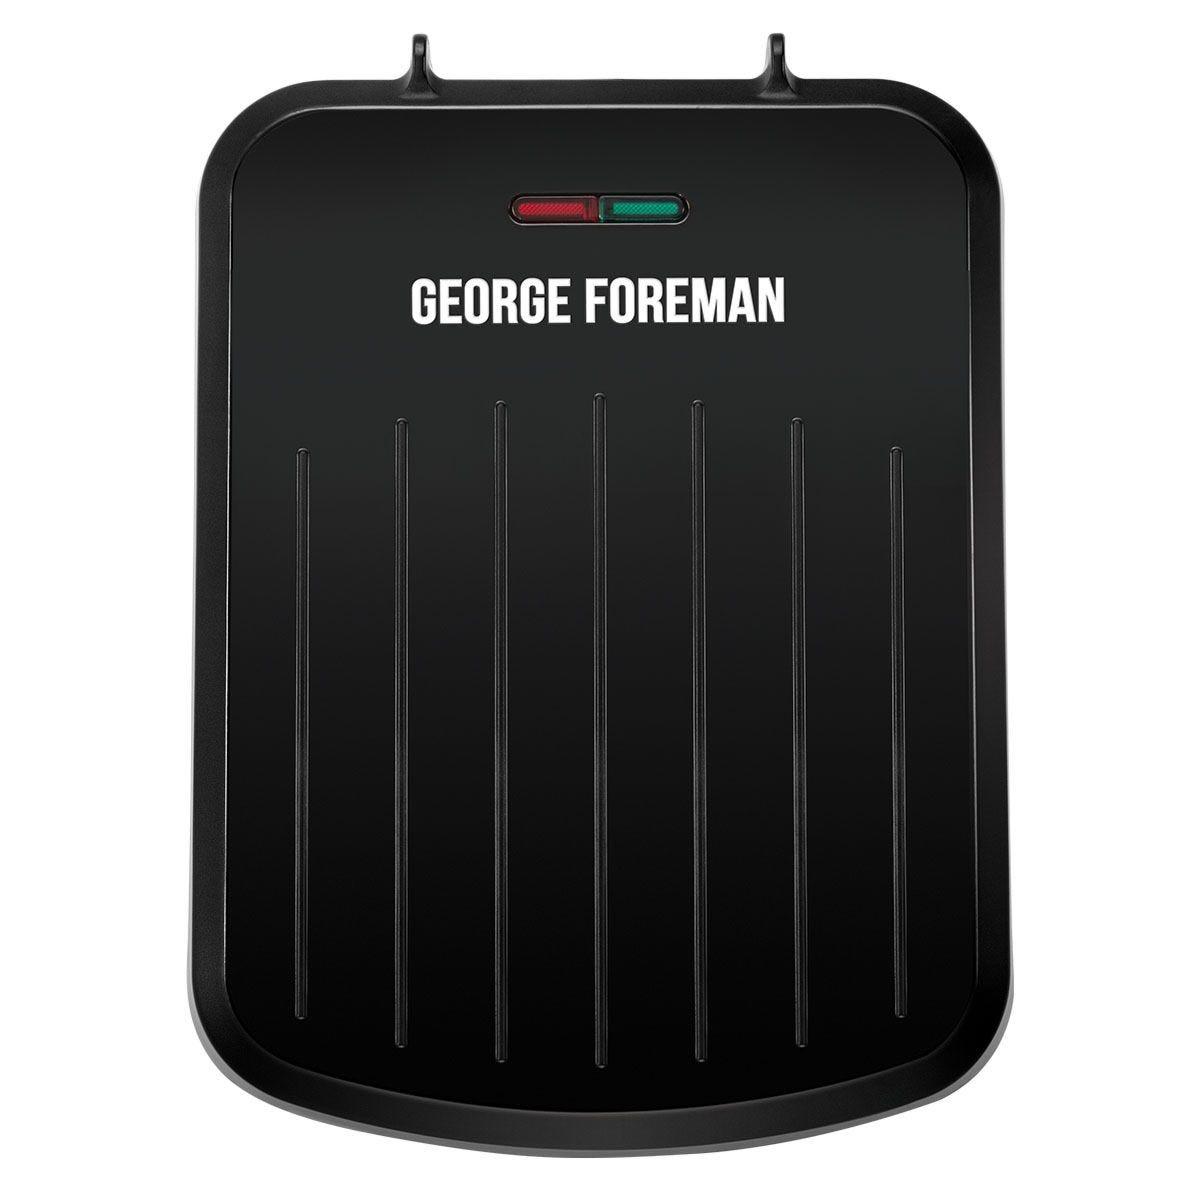 George Foreman 25800 Small Fit 760W Grill – Black